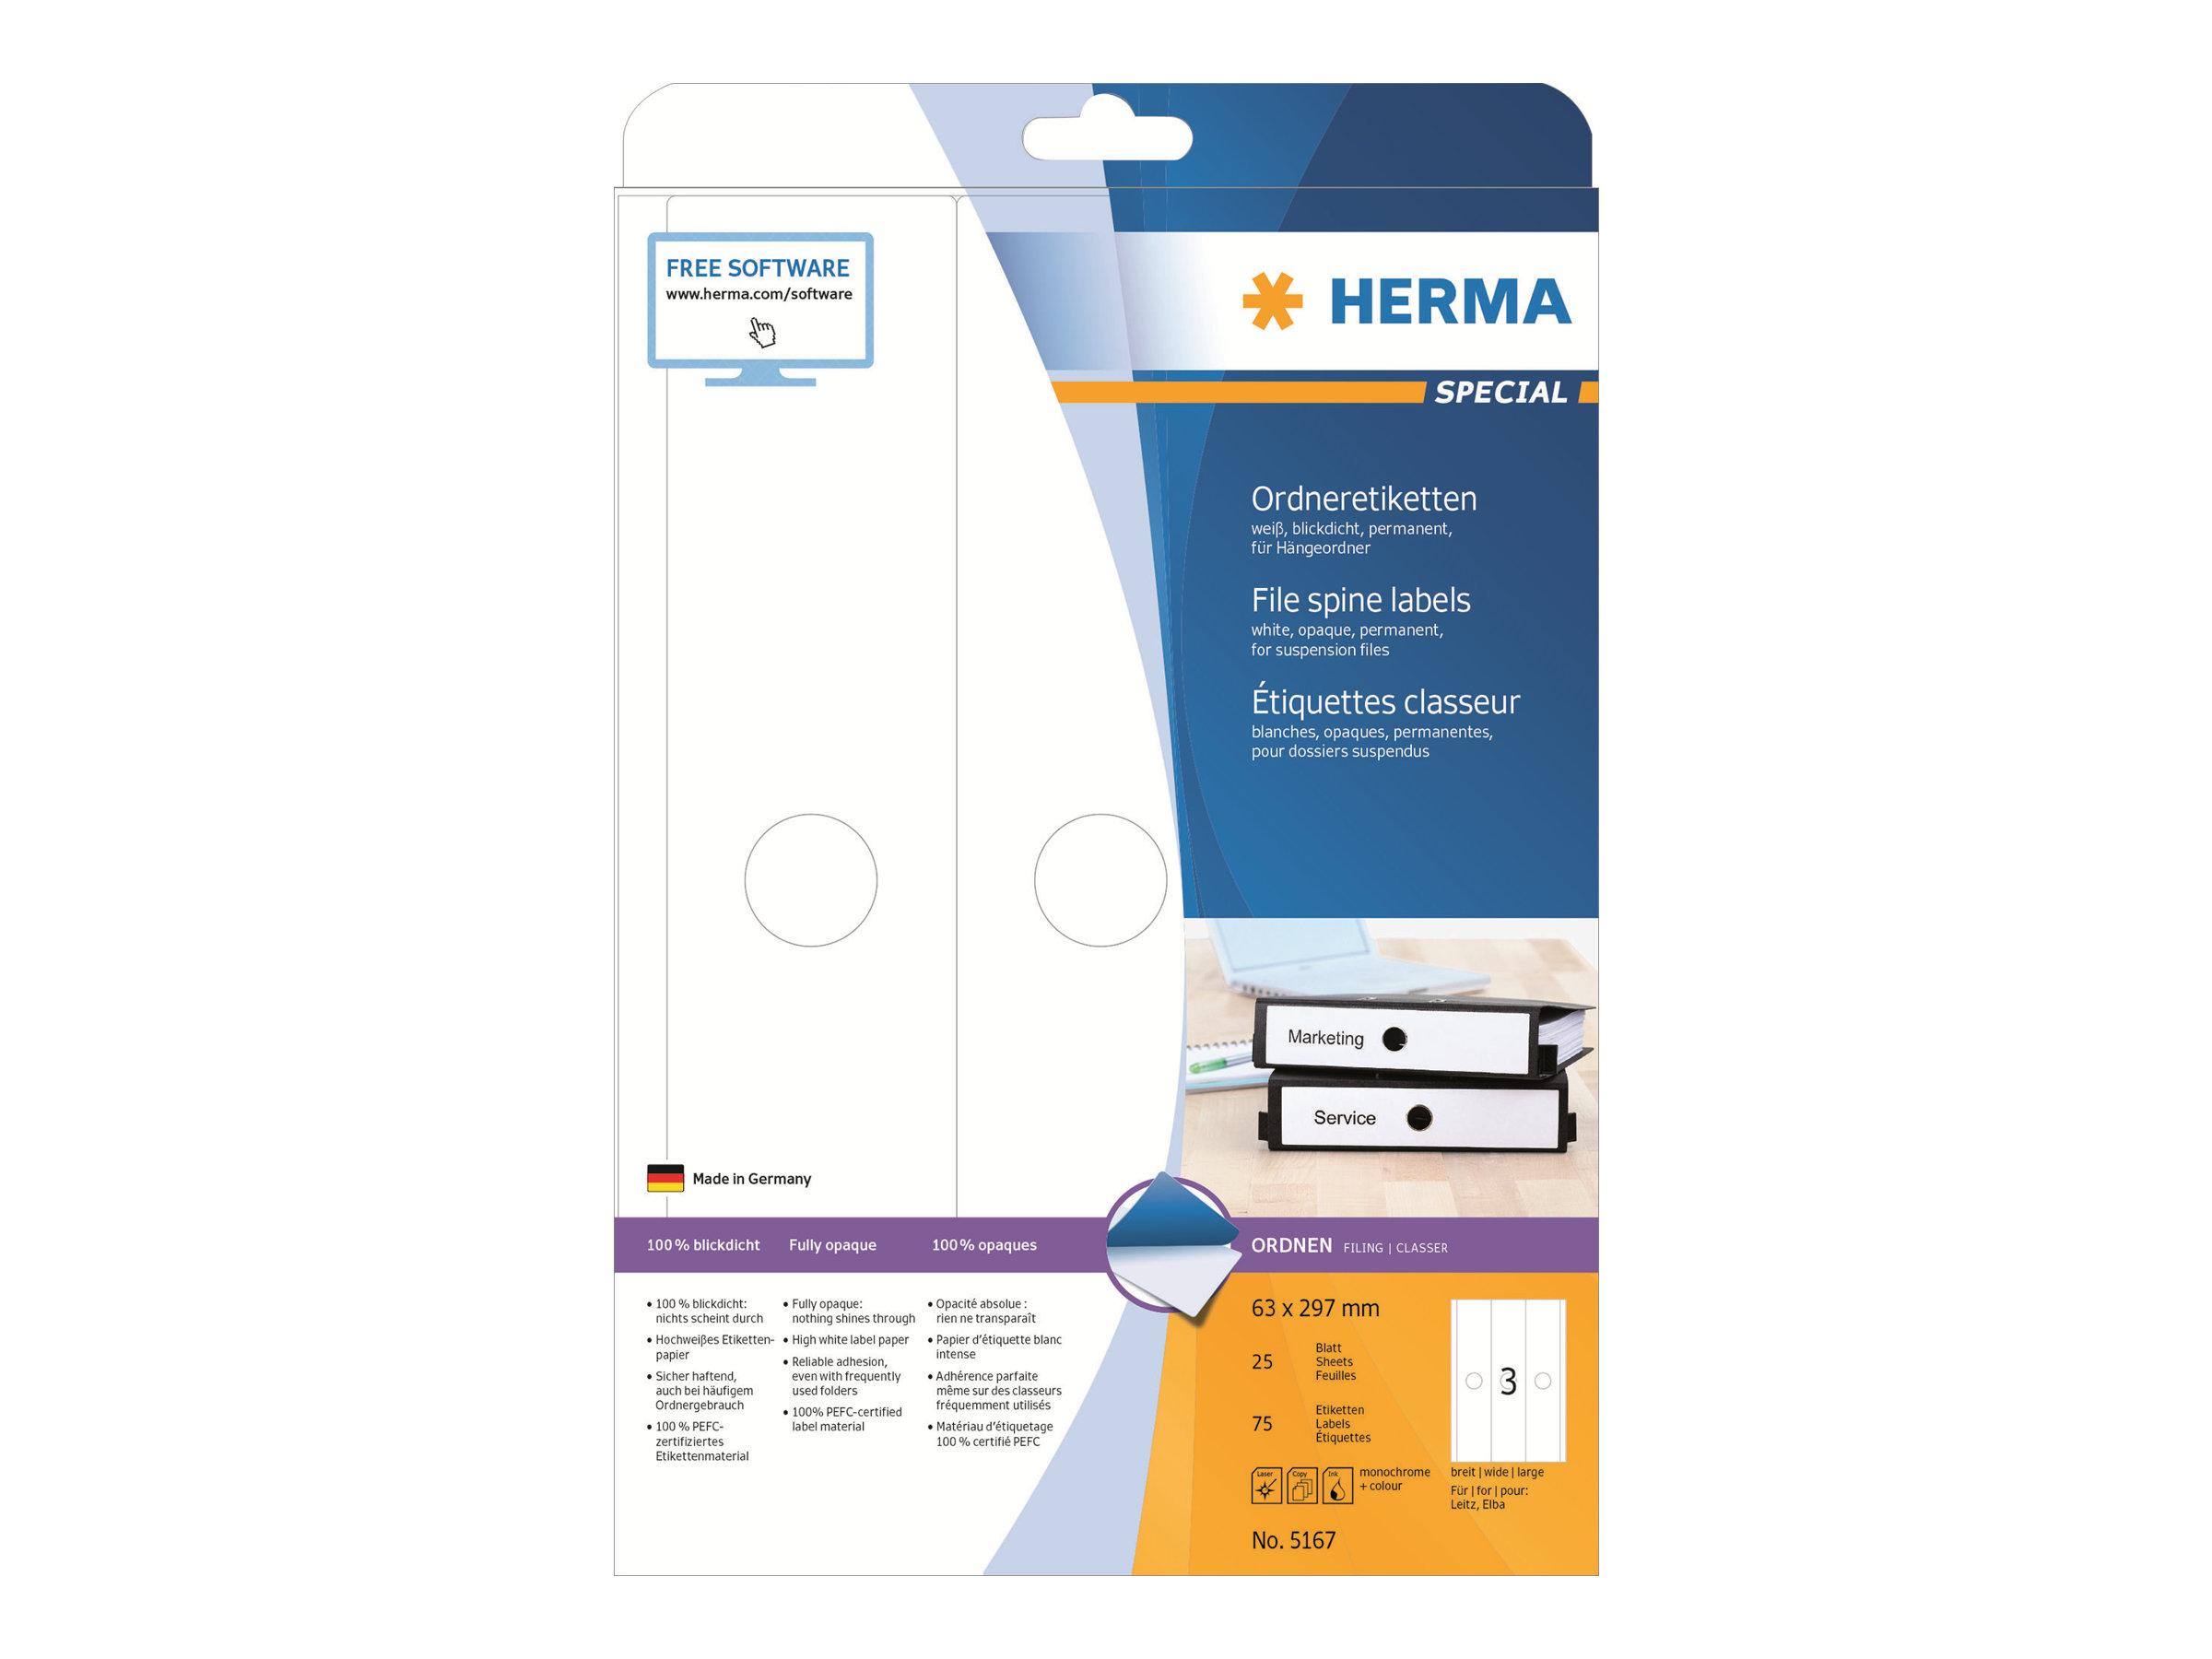 HERMA Special - Papier - matt - permanent selbstklebend - weiß - 63 x 297 mm 75 Etikett(en) (25 Bogen x 3)